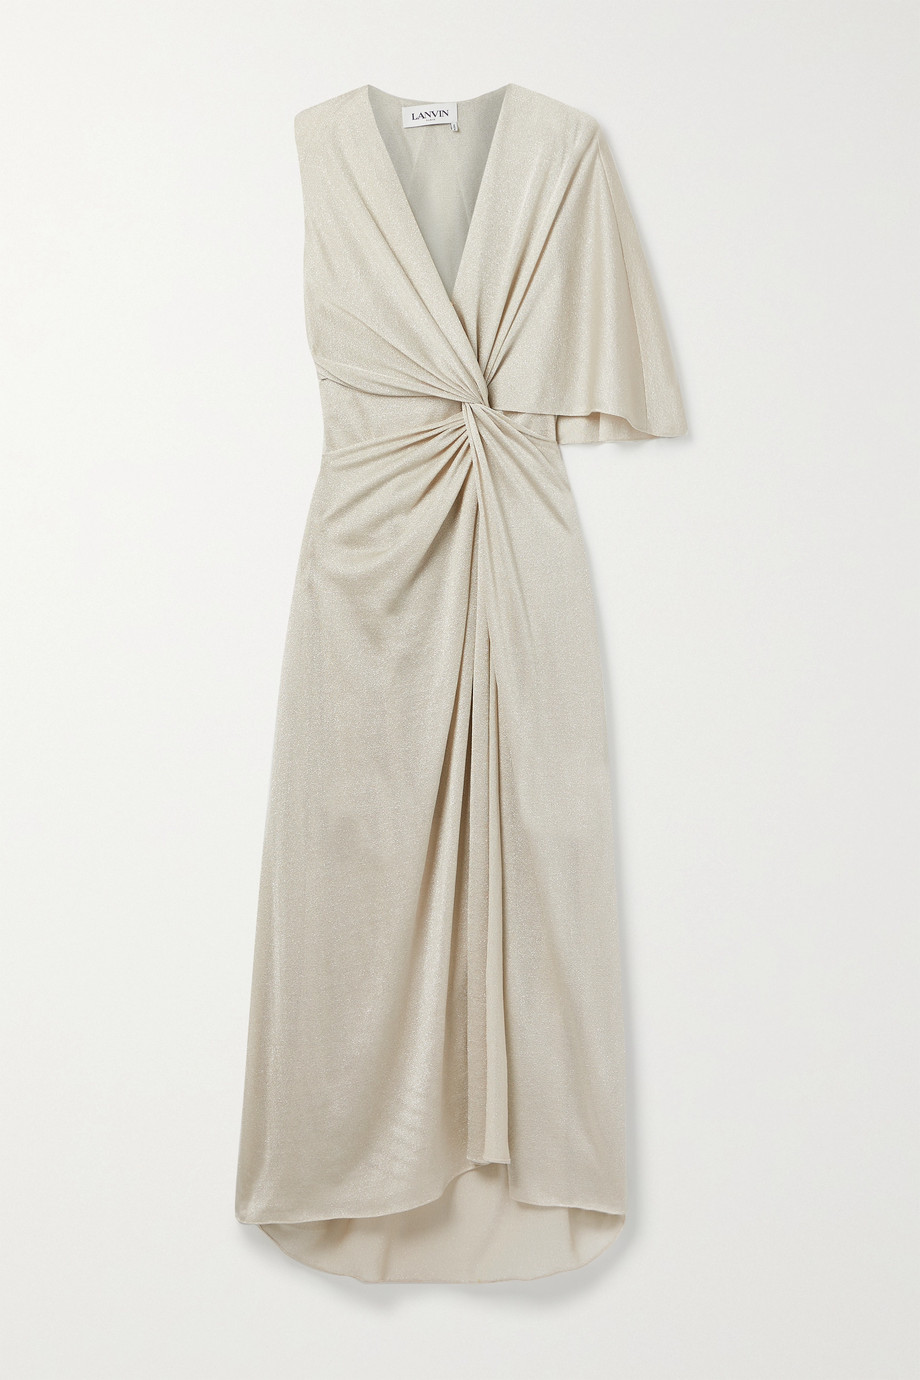 Lanvin Asymmetric knotted Lurex gown